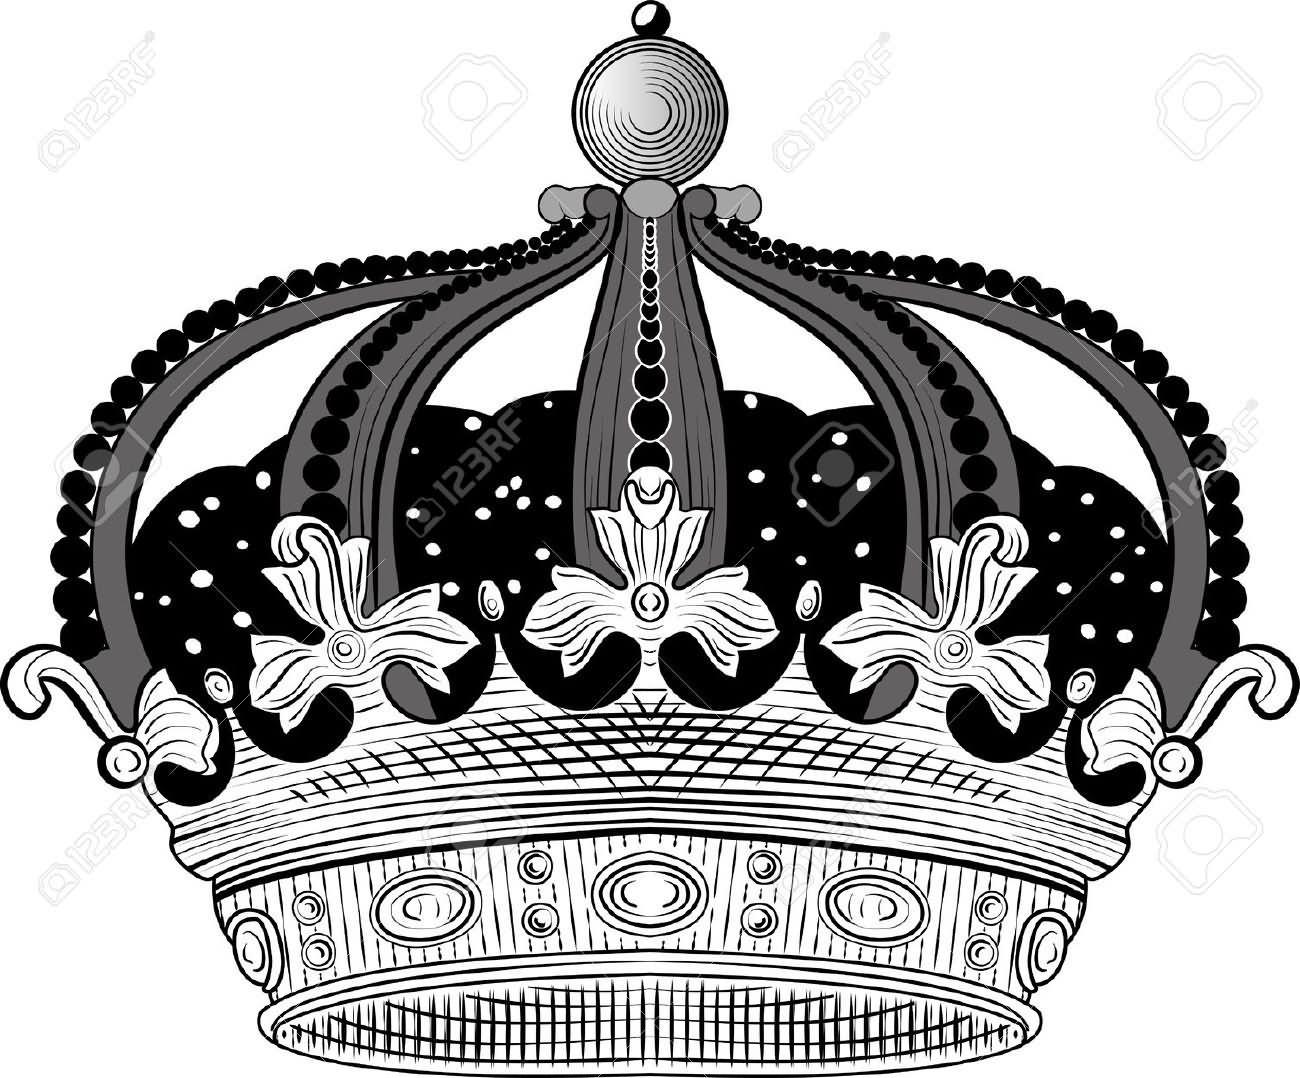 Stencil King Crown: 32+ King Crown Tattoos Designs